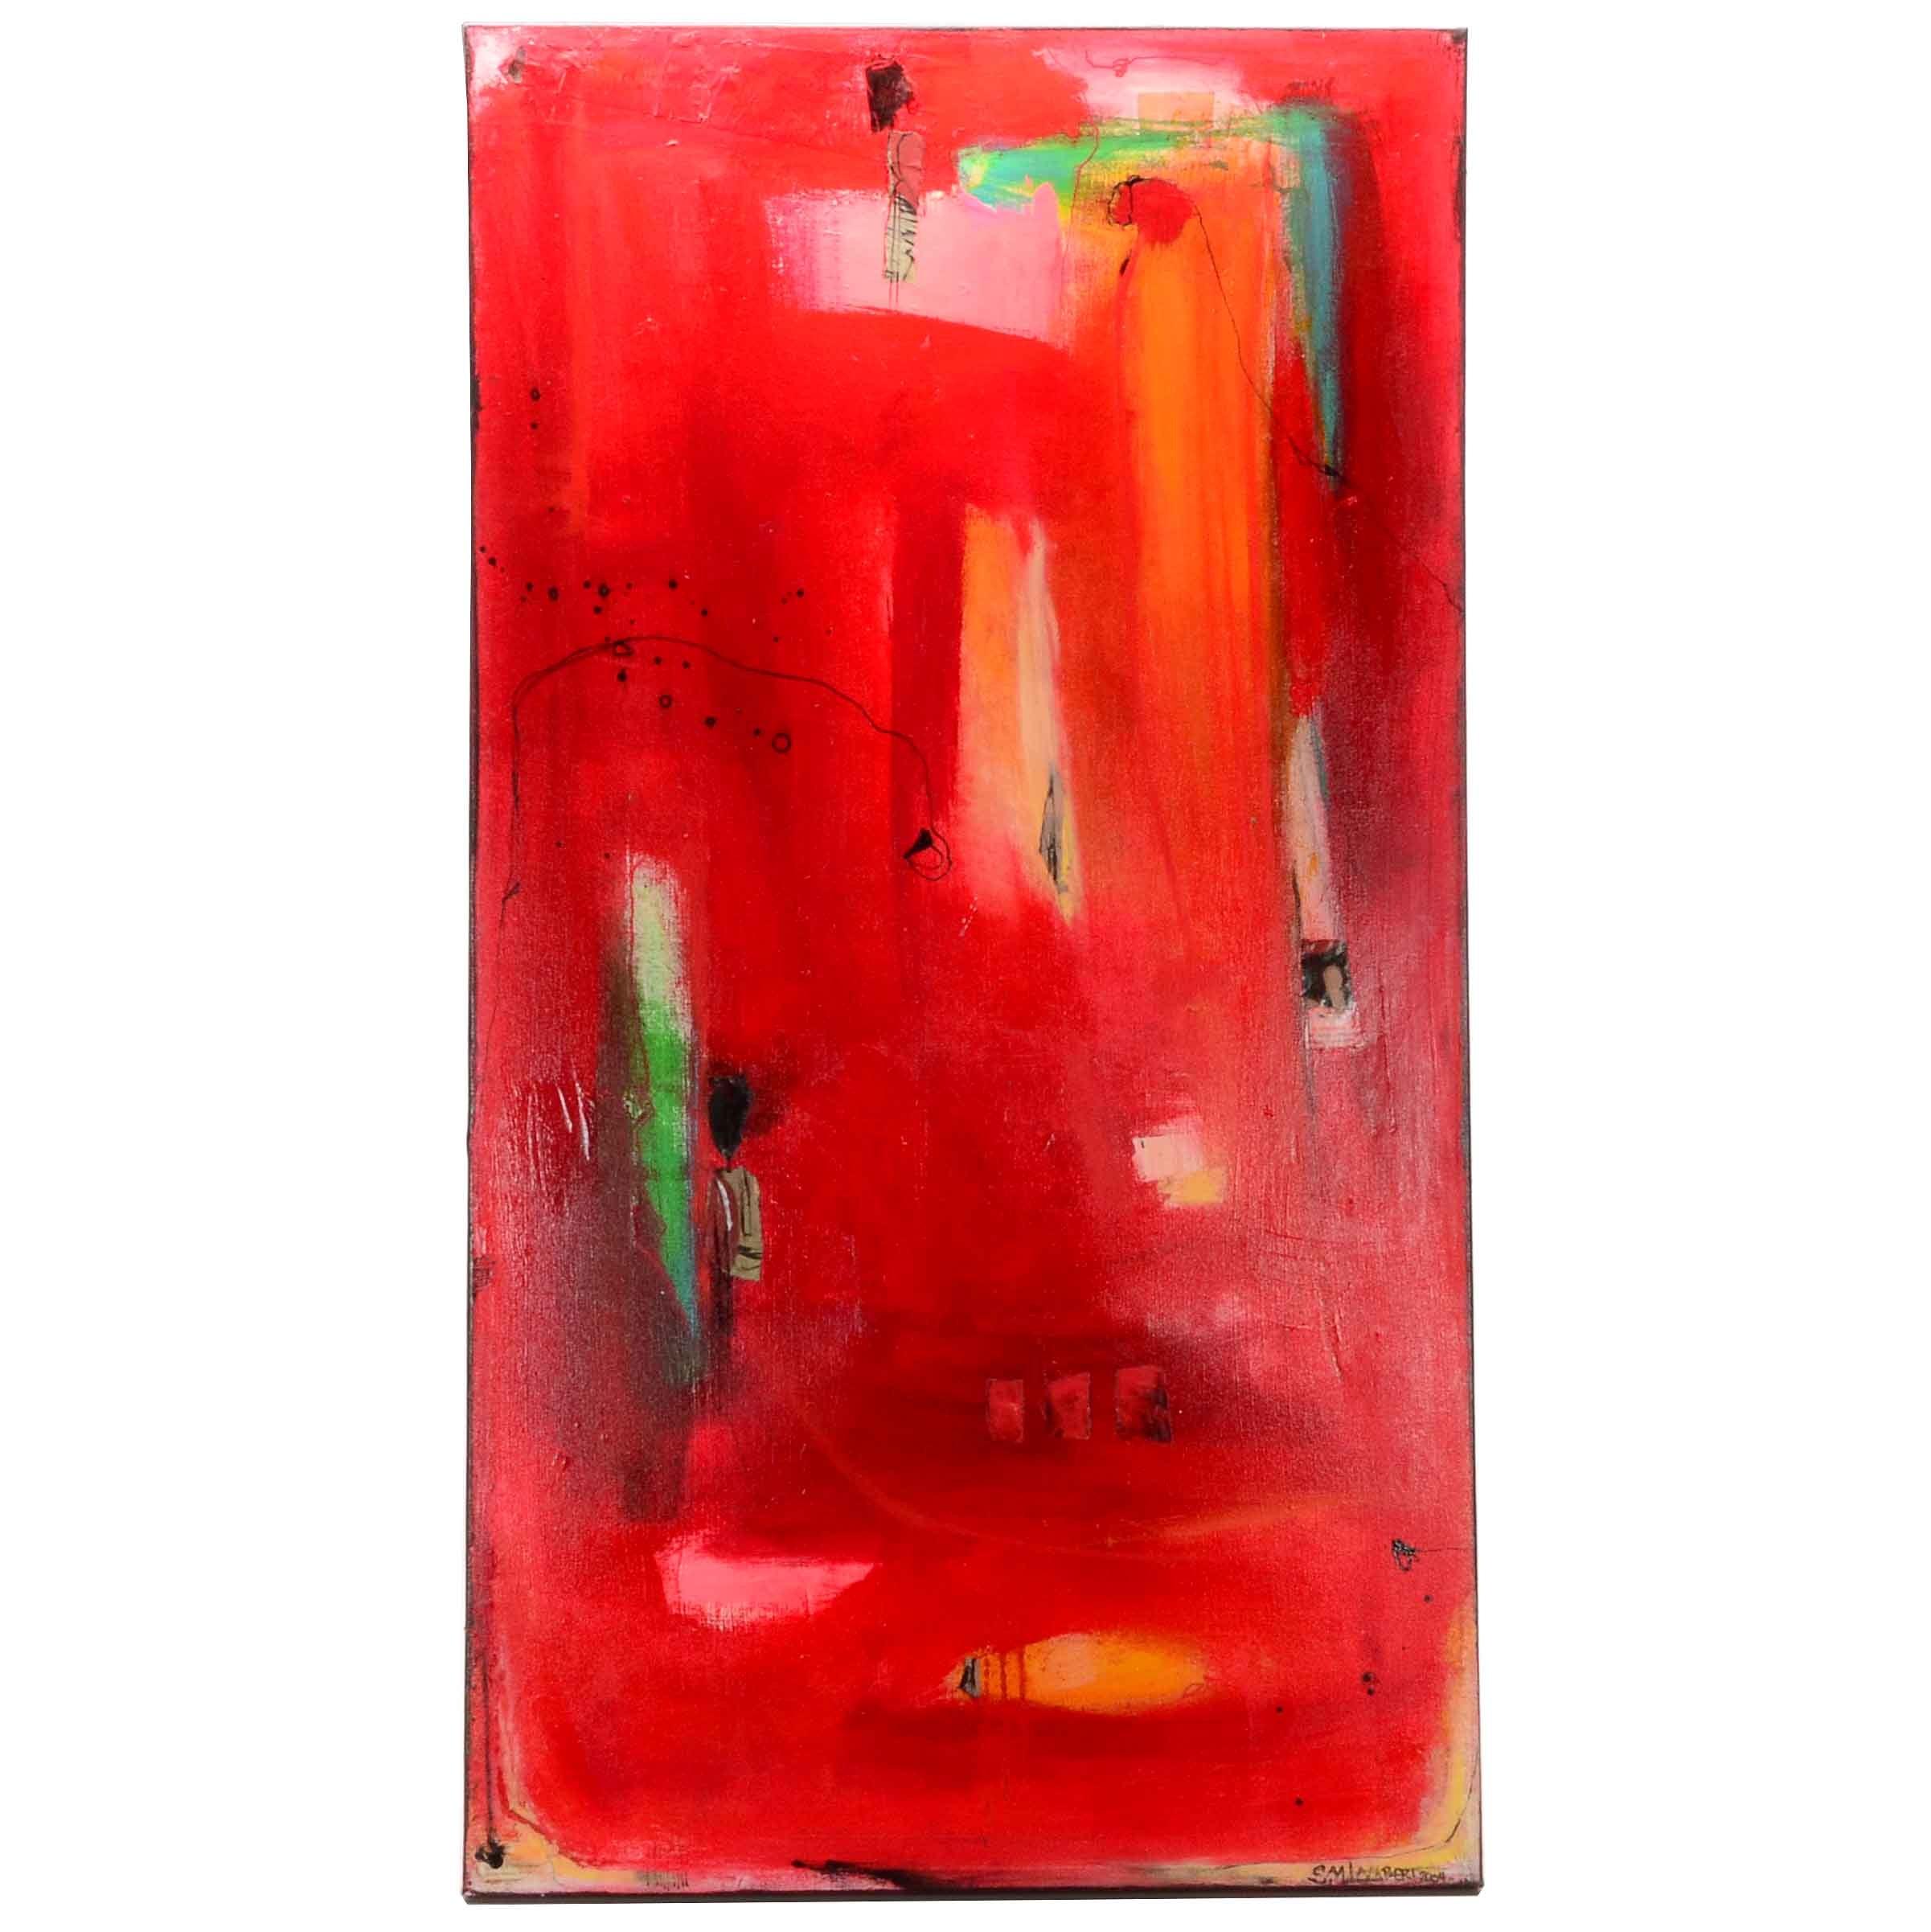 Suzanne Lambert Original 2004 Mixed Media Abstract Painting